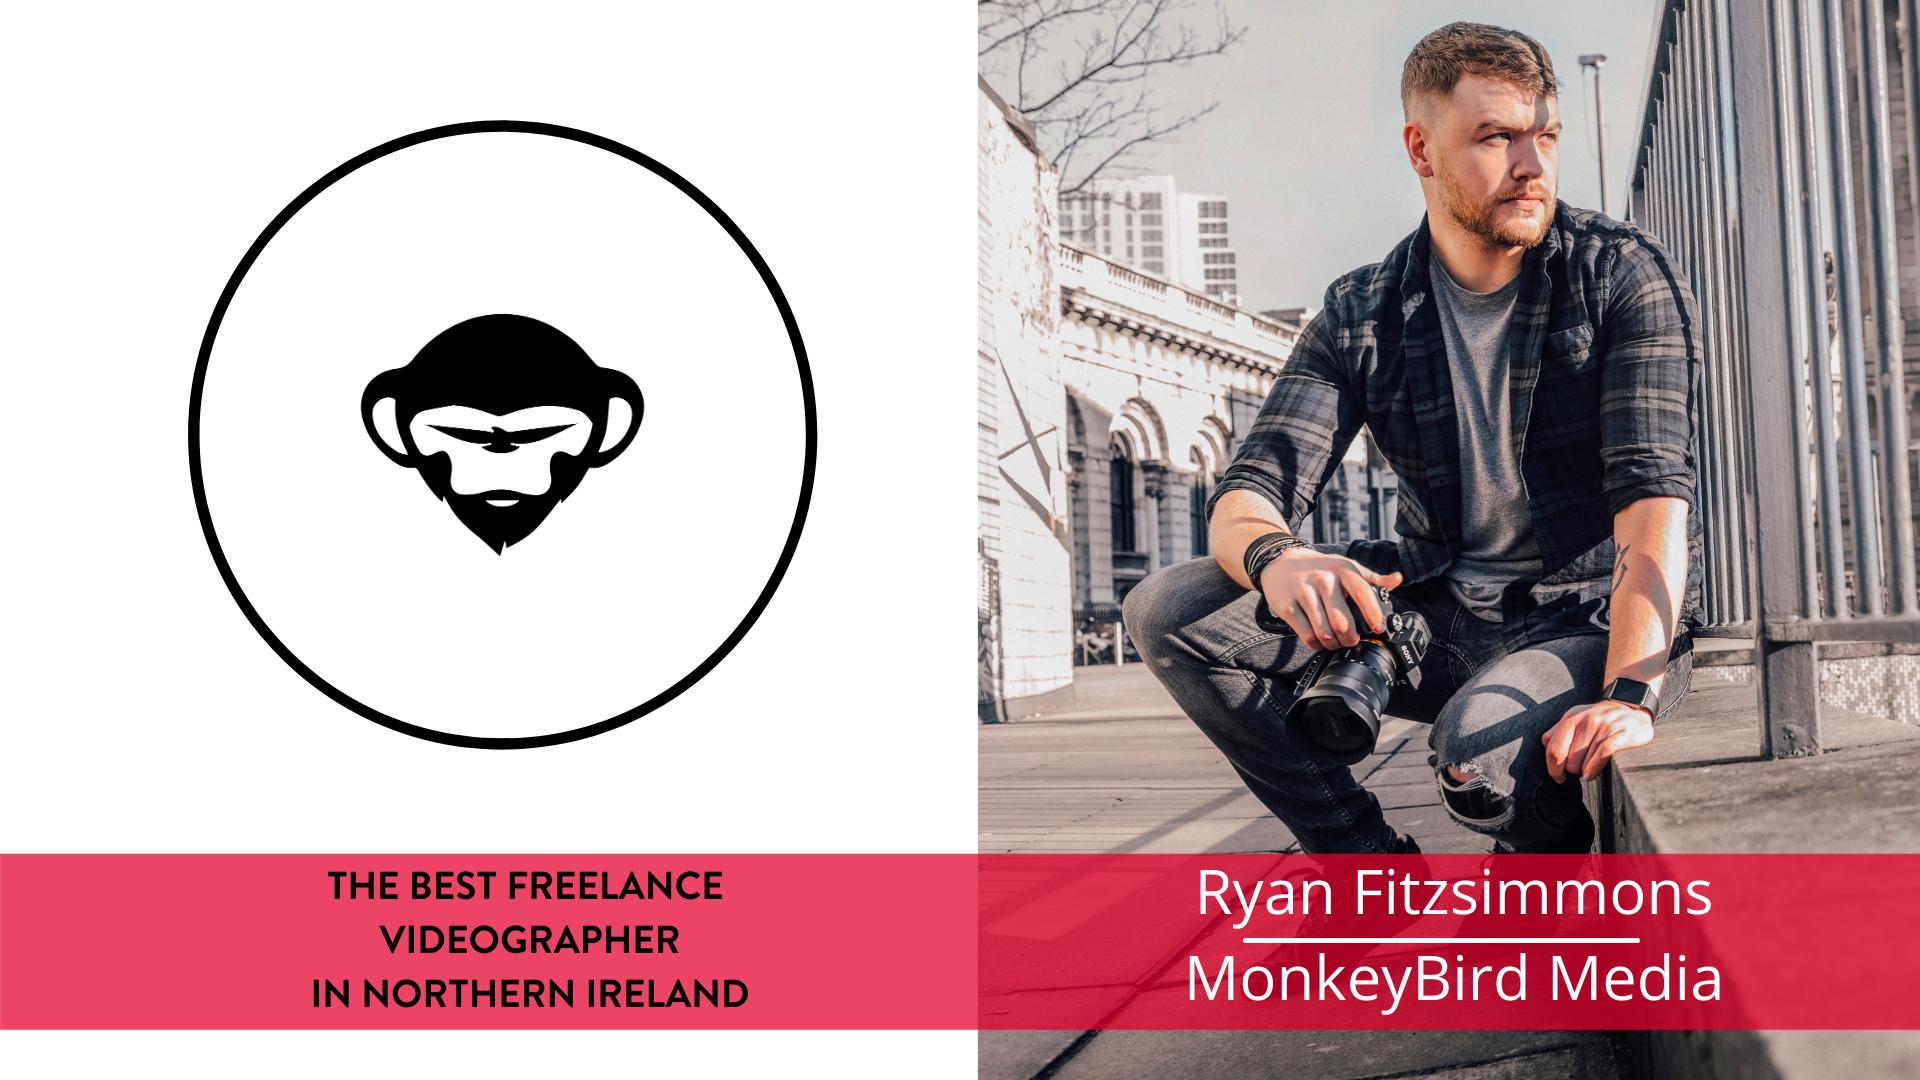 The best freelance Videographer in Northern Ireland - Ryan Fitzsimmons, MonkeyBird Media